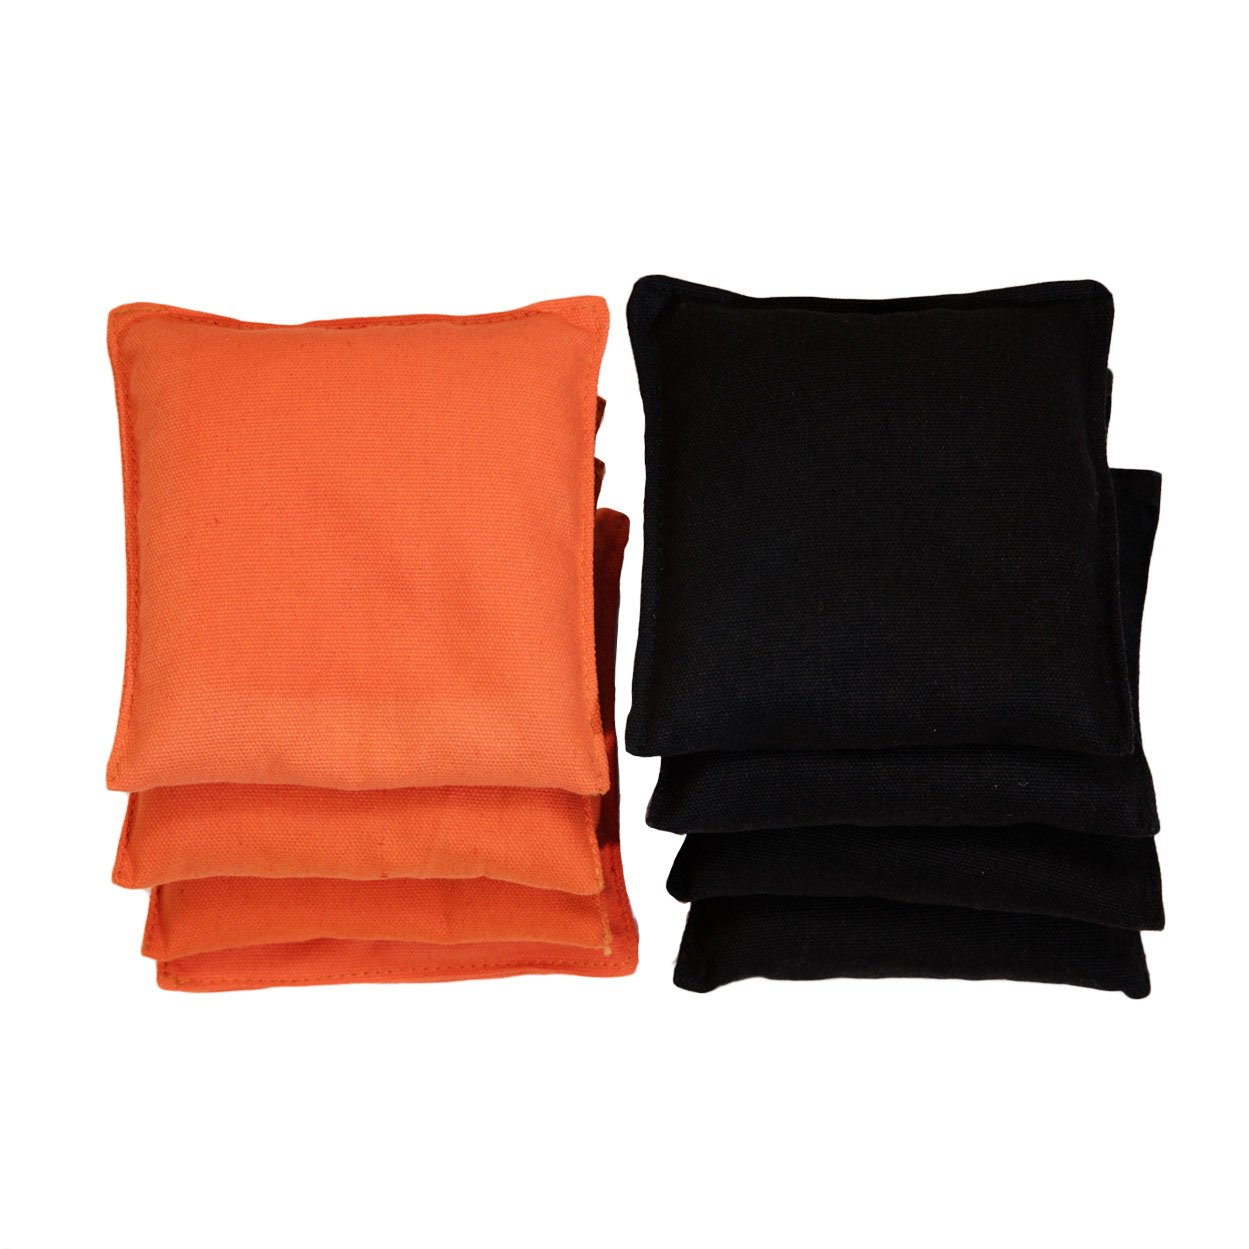 Sports Festival Newest Version Premium All-Weather Duck Cloth Cornhole Replacement Bean Bag Set Total Count 8 (Black & Orange)